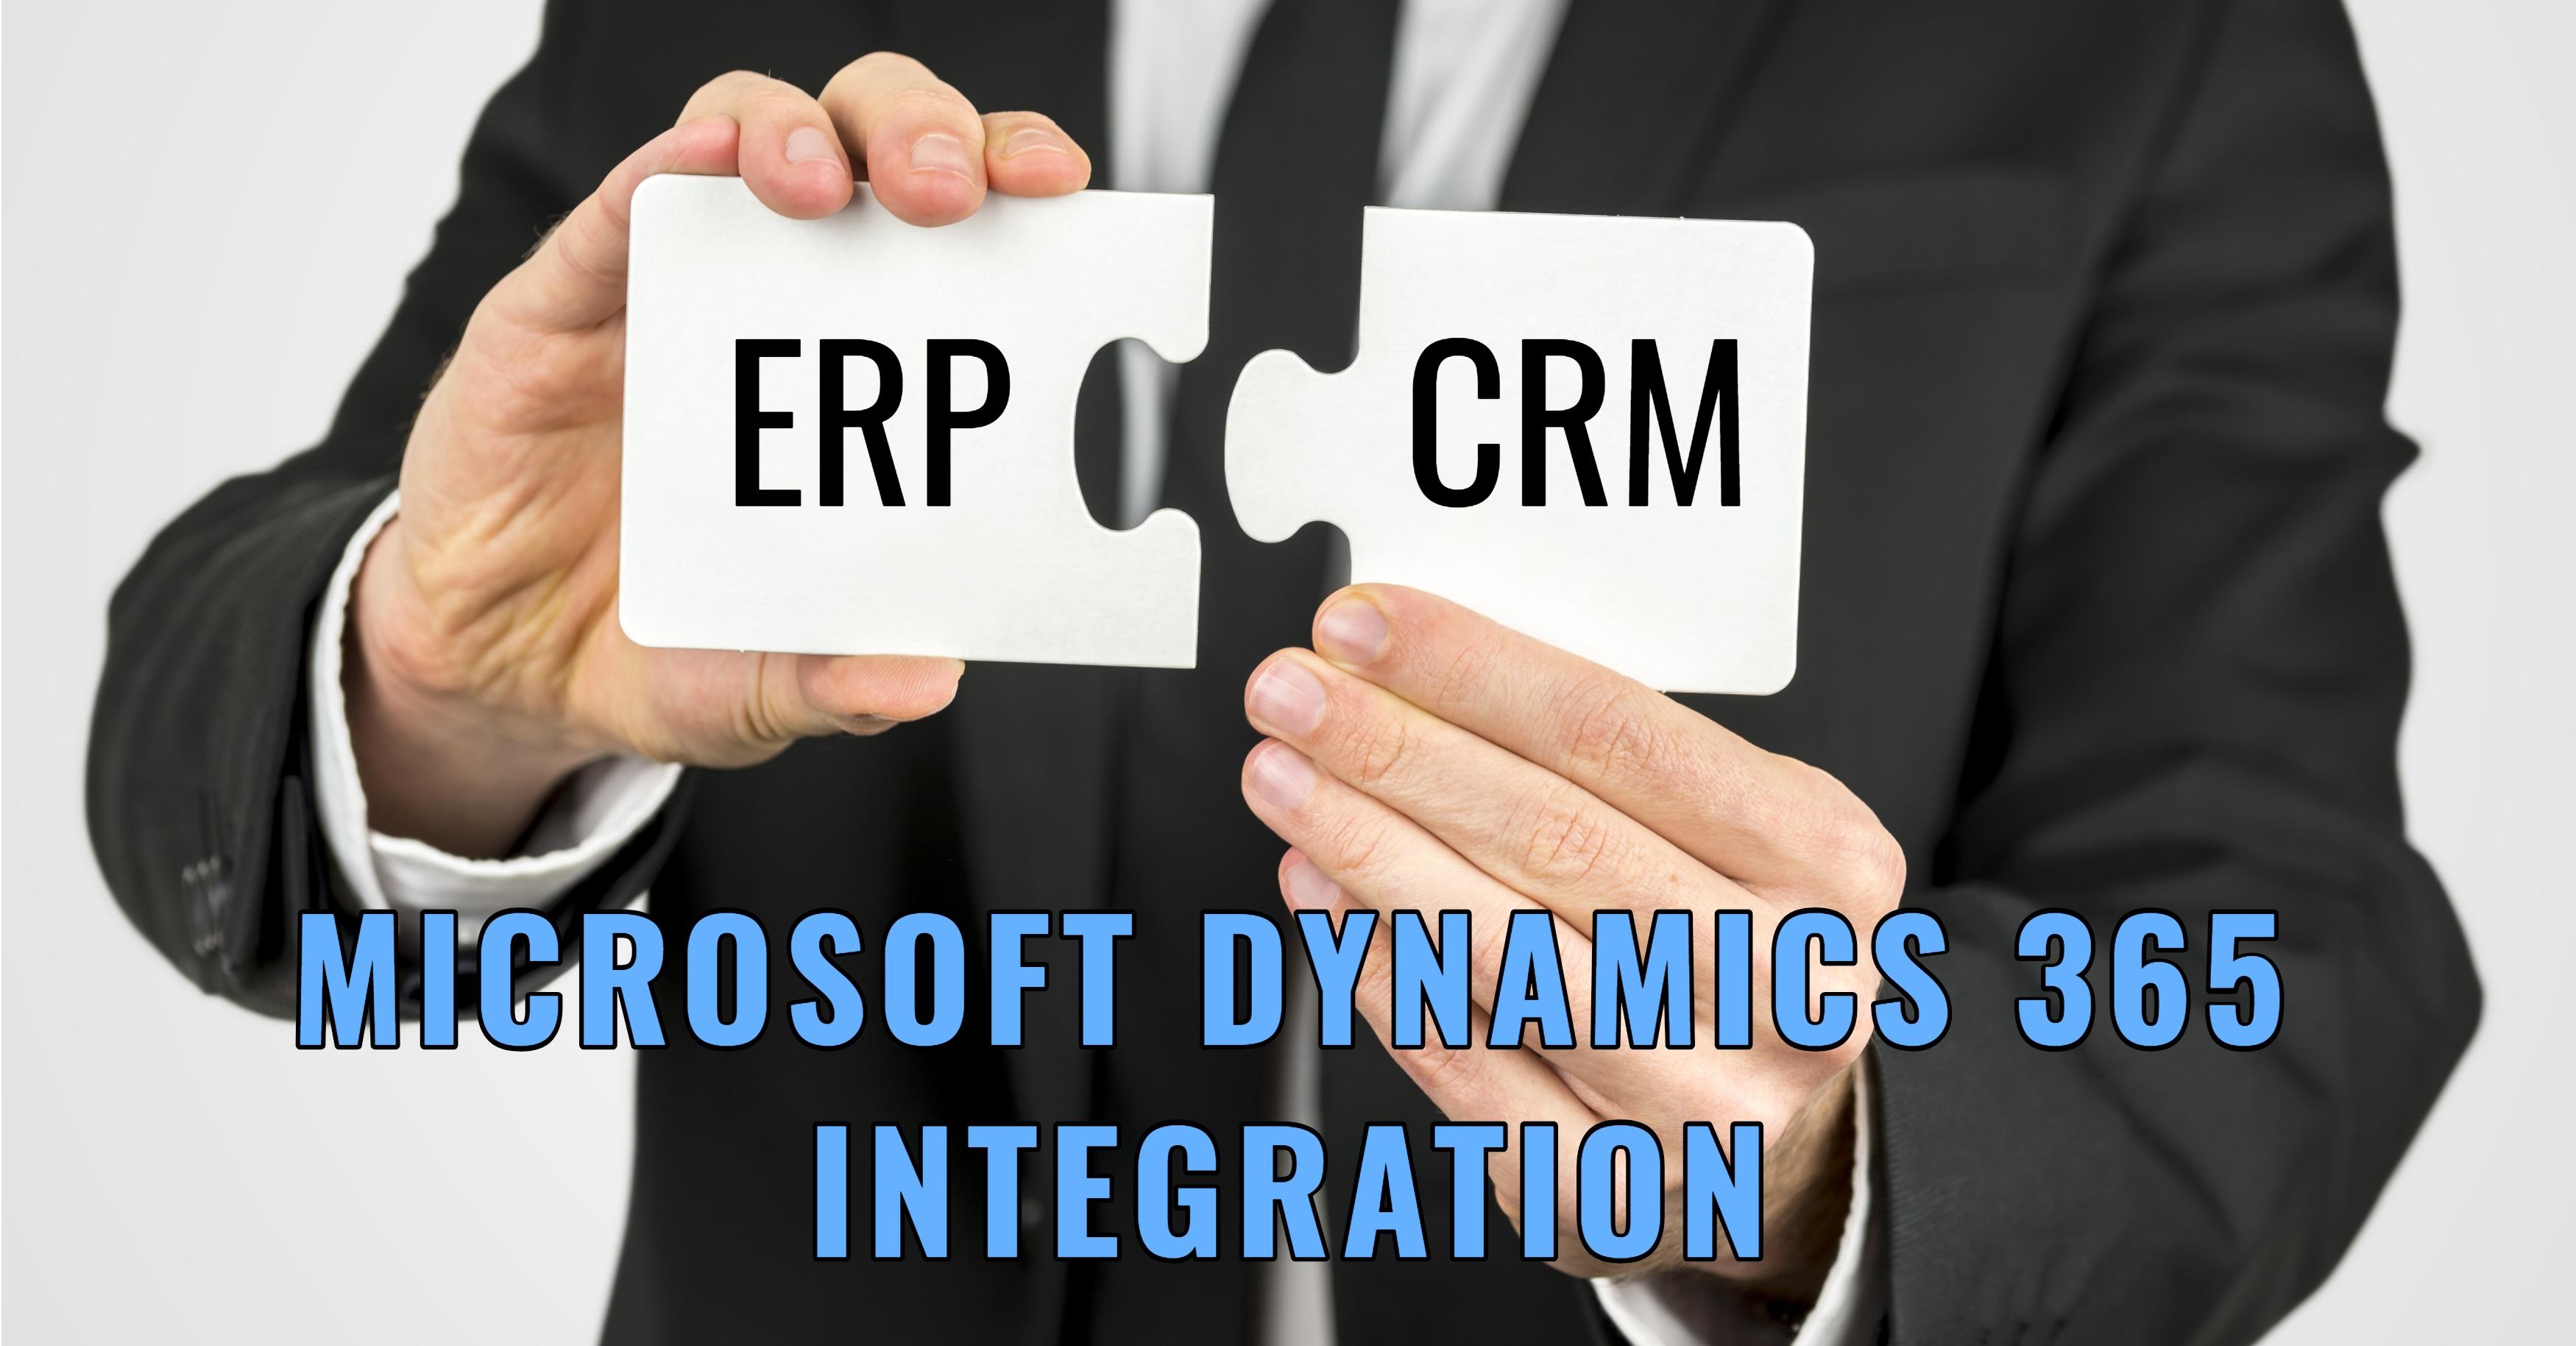 Microsoft Dynamics 365 Integration